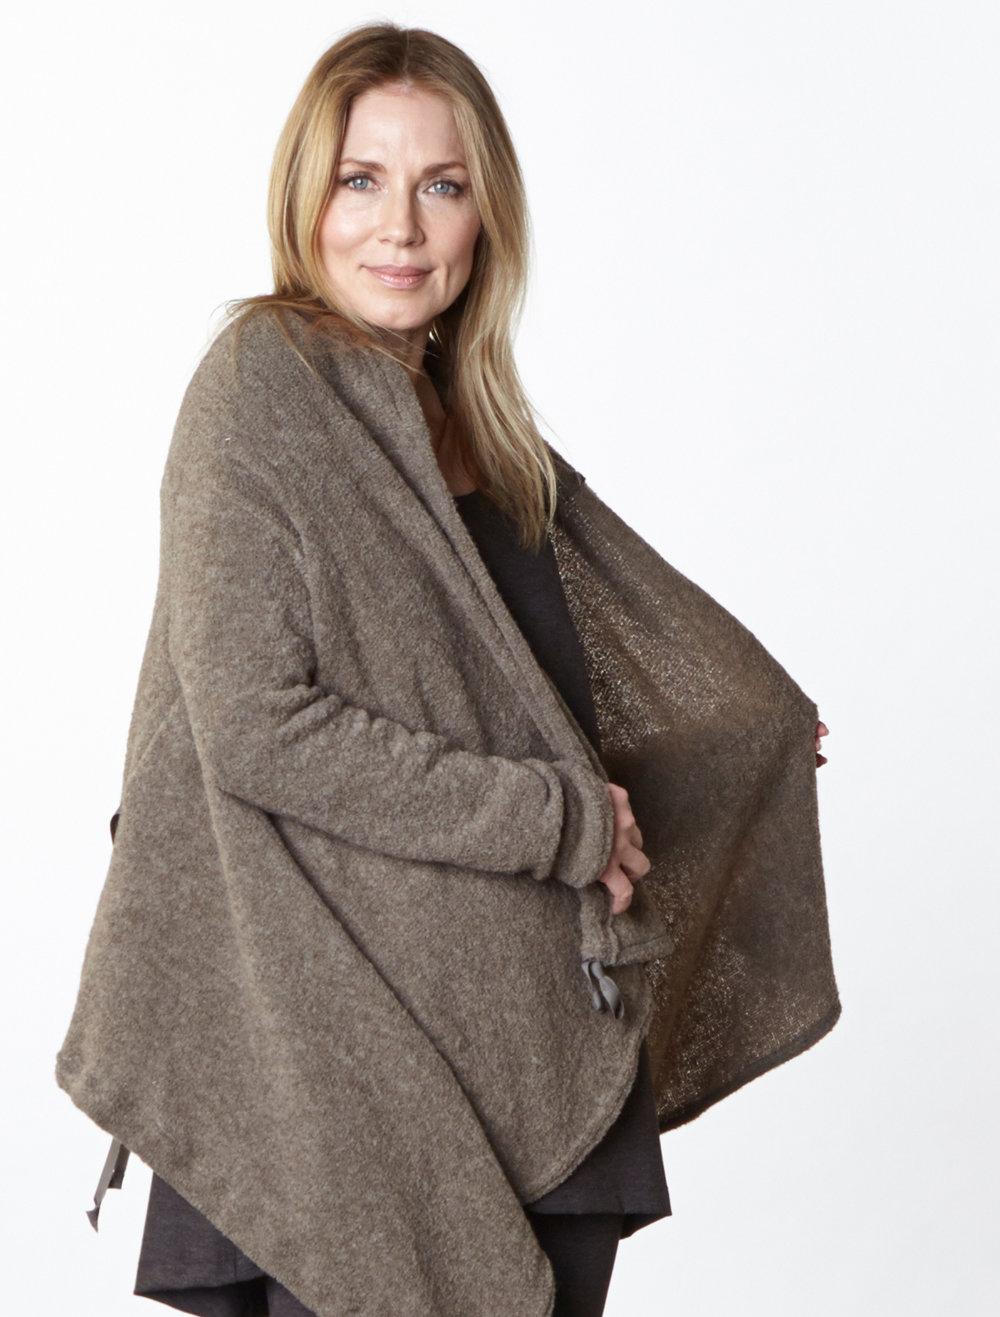 Eva Cardigan in Taupe Italian Wool, Liam Tunic, Legging in Chocolate Italian Melange